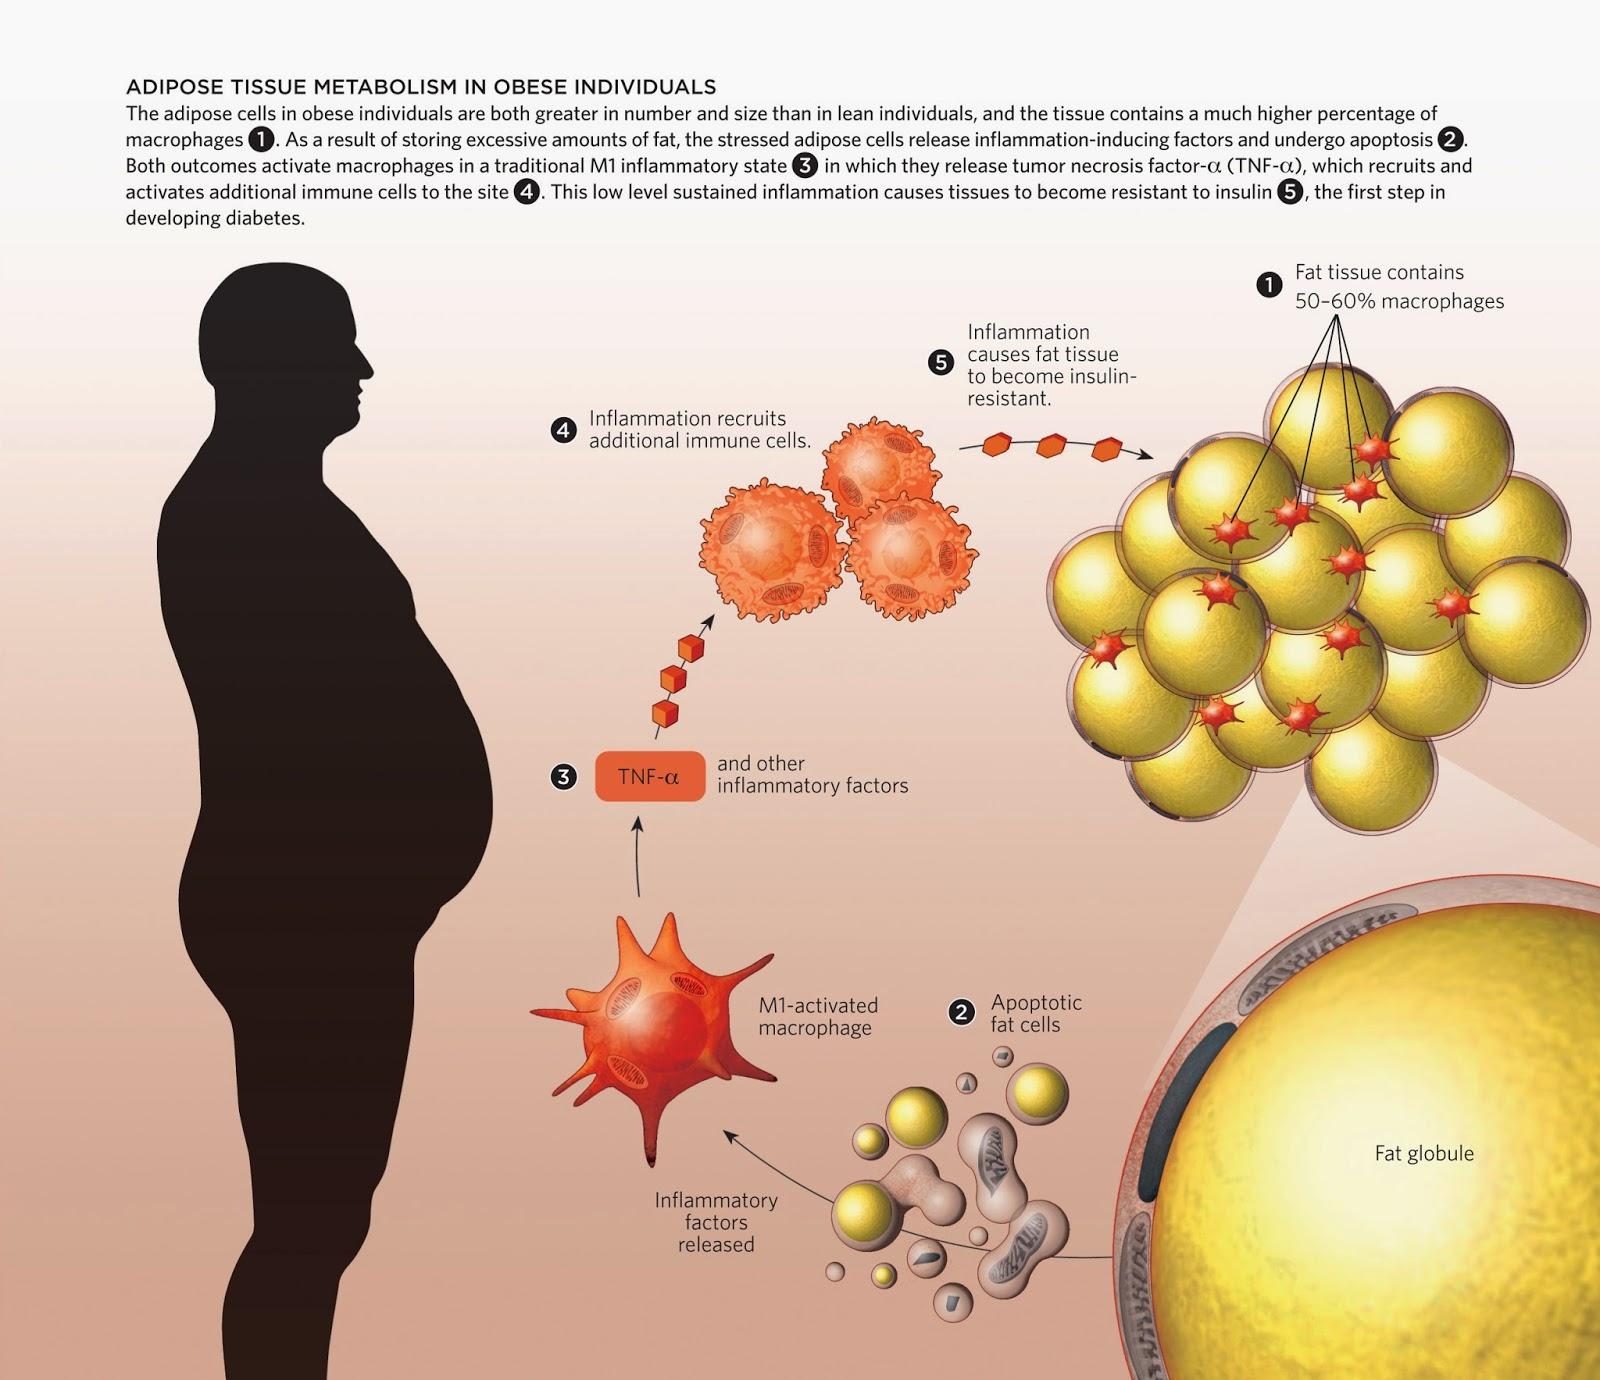 White Fat Cell Diagram 1995 Ford F150 Ignition Wiring Obesidade Abdominal Visceral Central E Sua ImportÂncia